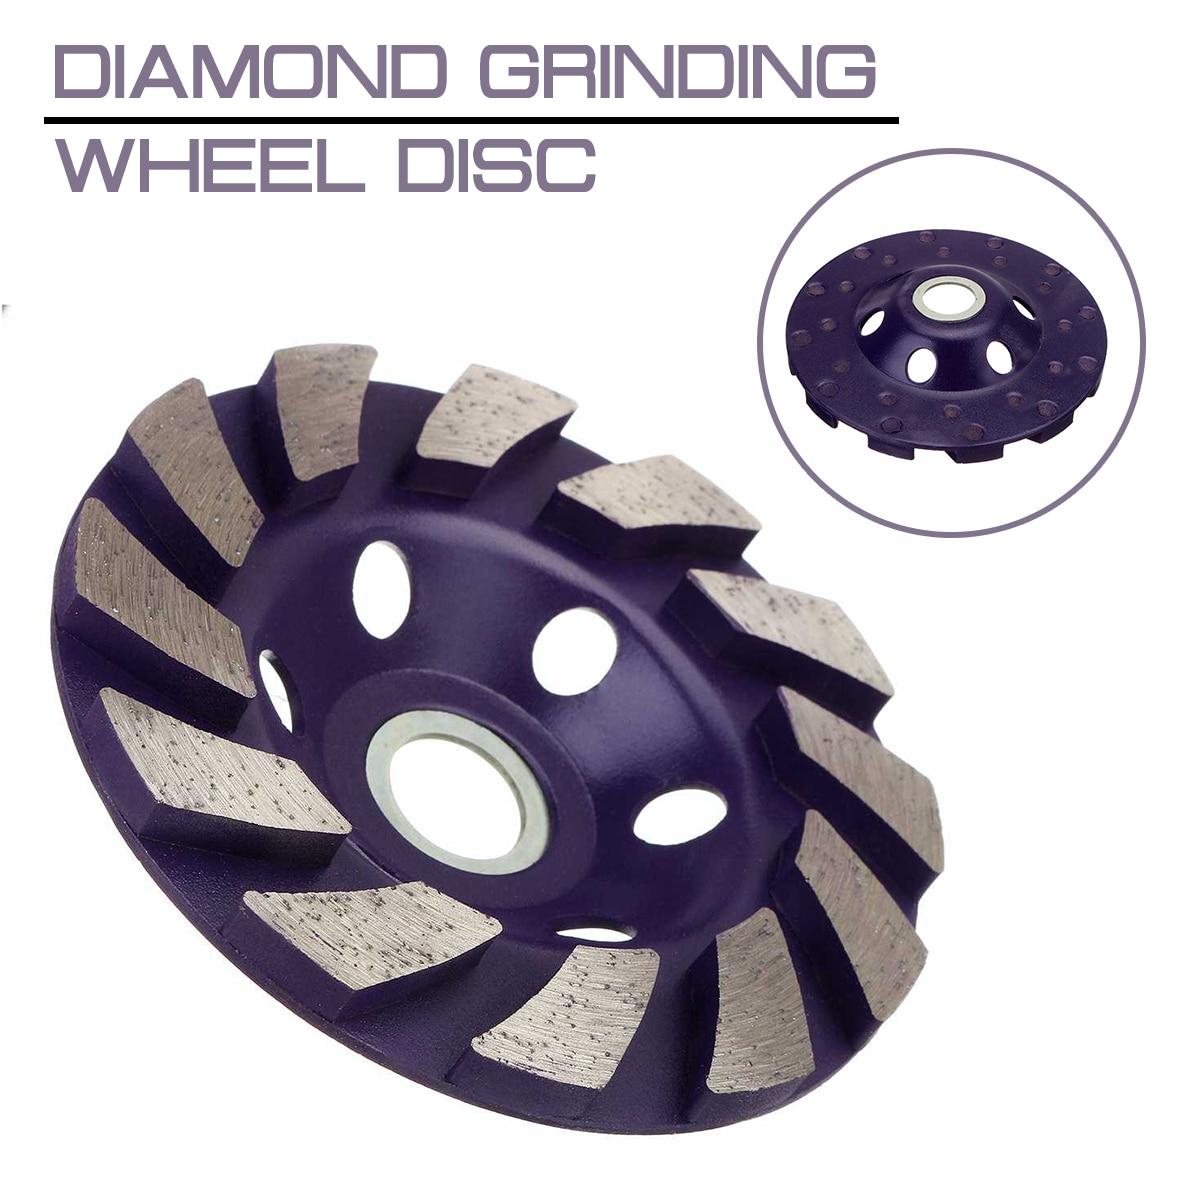 "4"" 100mm 1pcs Diamond Grinding Wheel Disc Bowl Shape Grinding Cup Concrete Granite Stone Ceramic Cutting Disc Piece Power Tools"